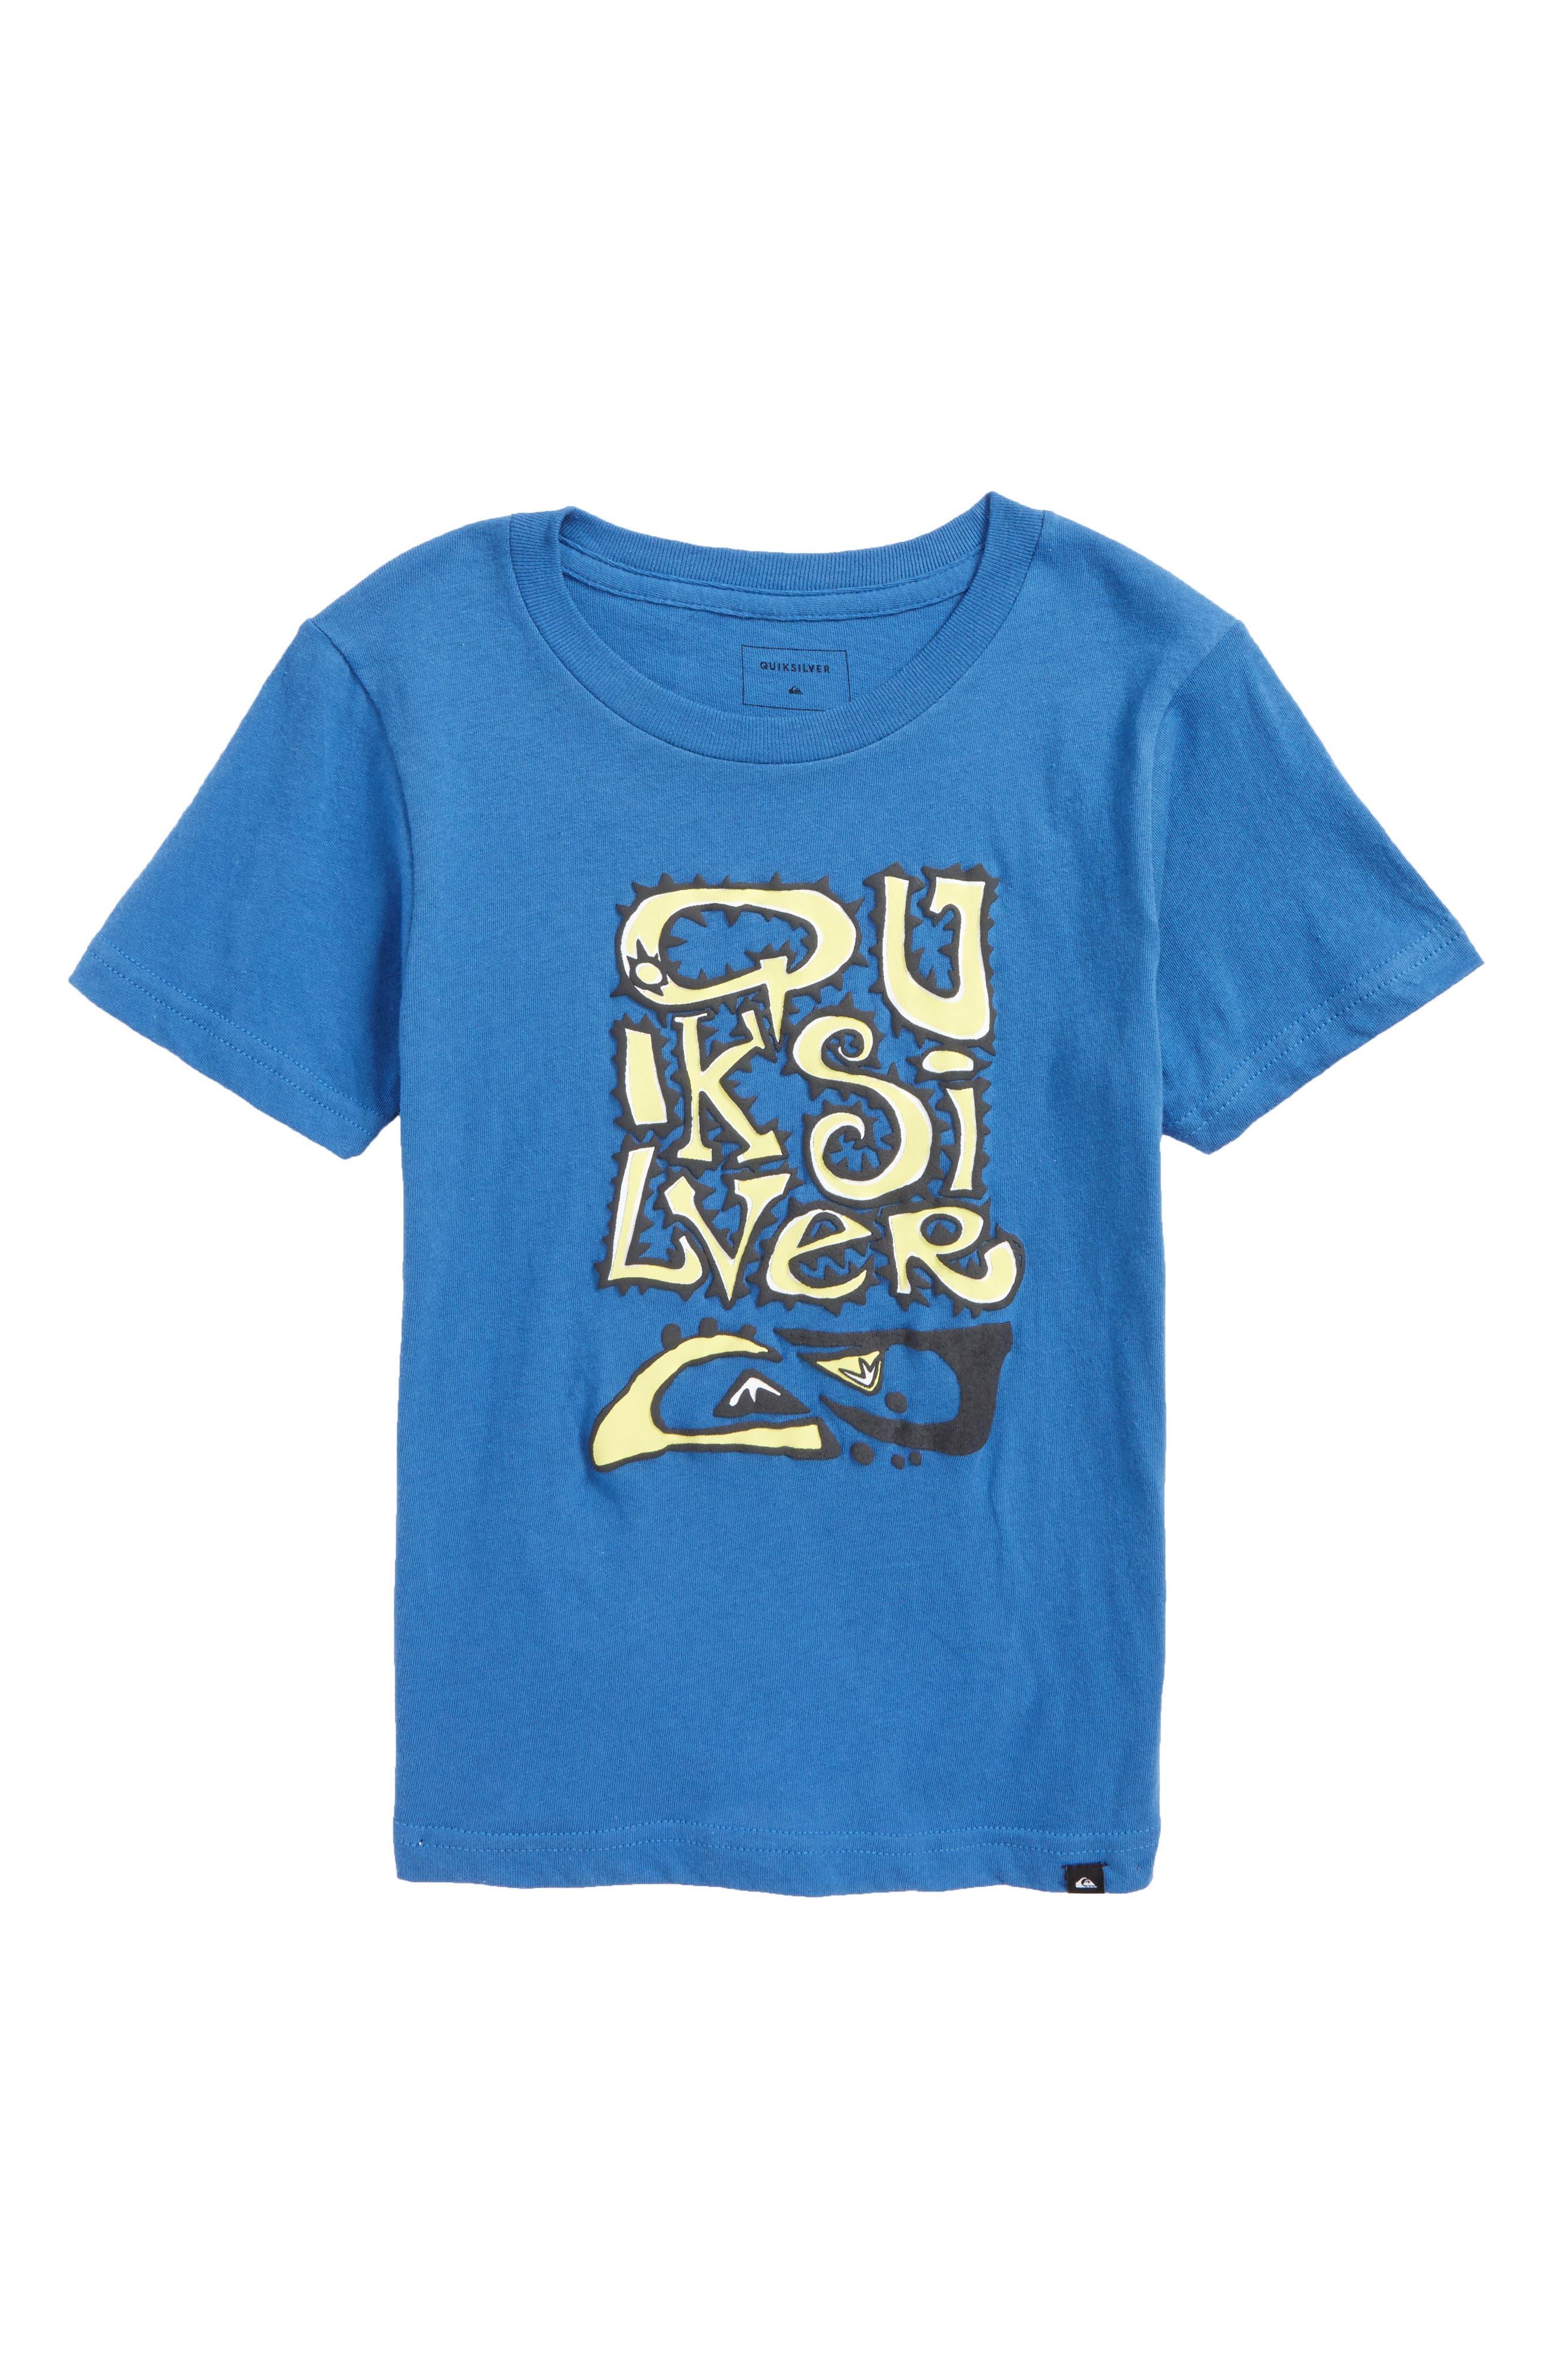 Main Image - Quiksilver Wauke Graphic T-Shirt (Toddler Boys & Little Boys)